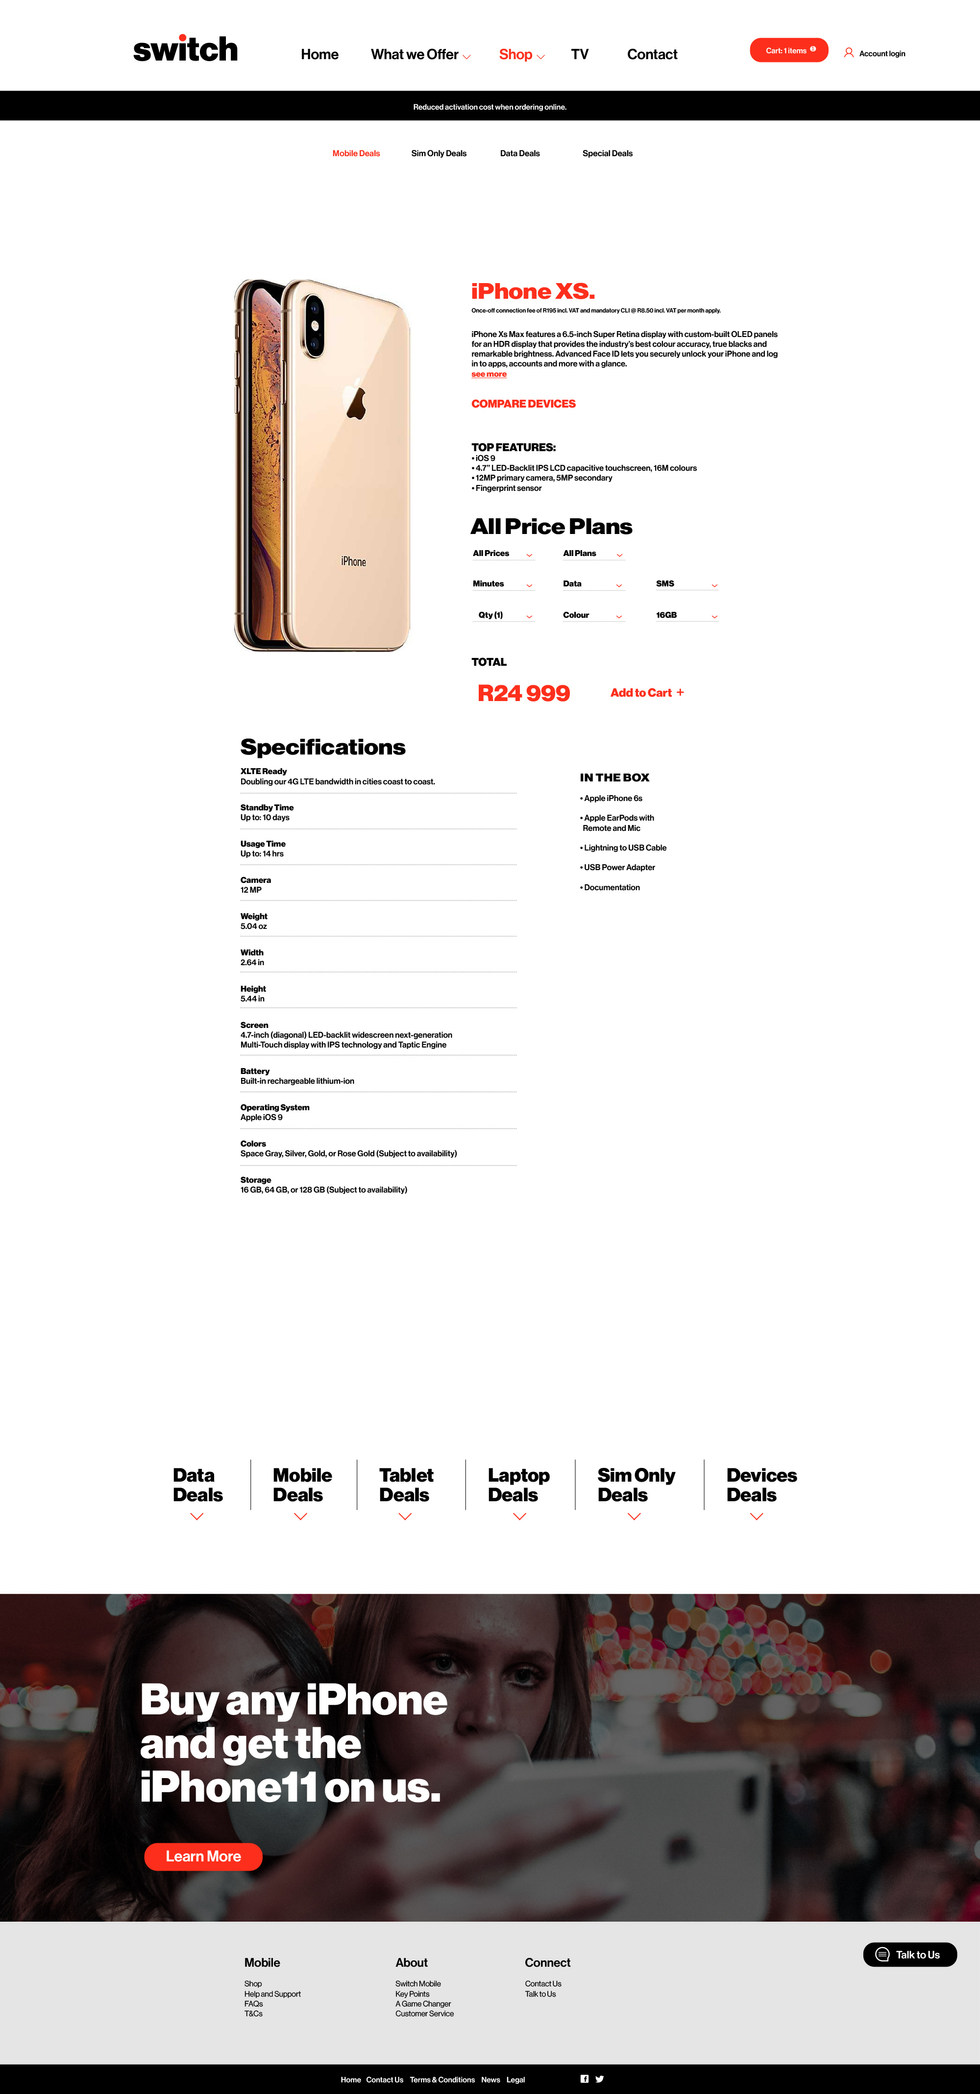 Switch-Mobile-Website-UI-UX20-4.jpg